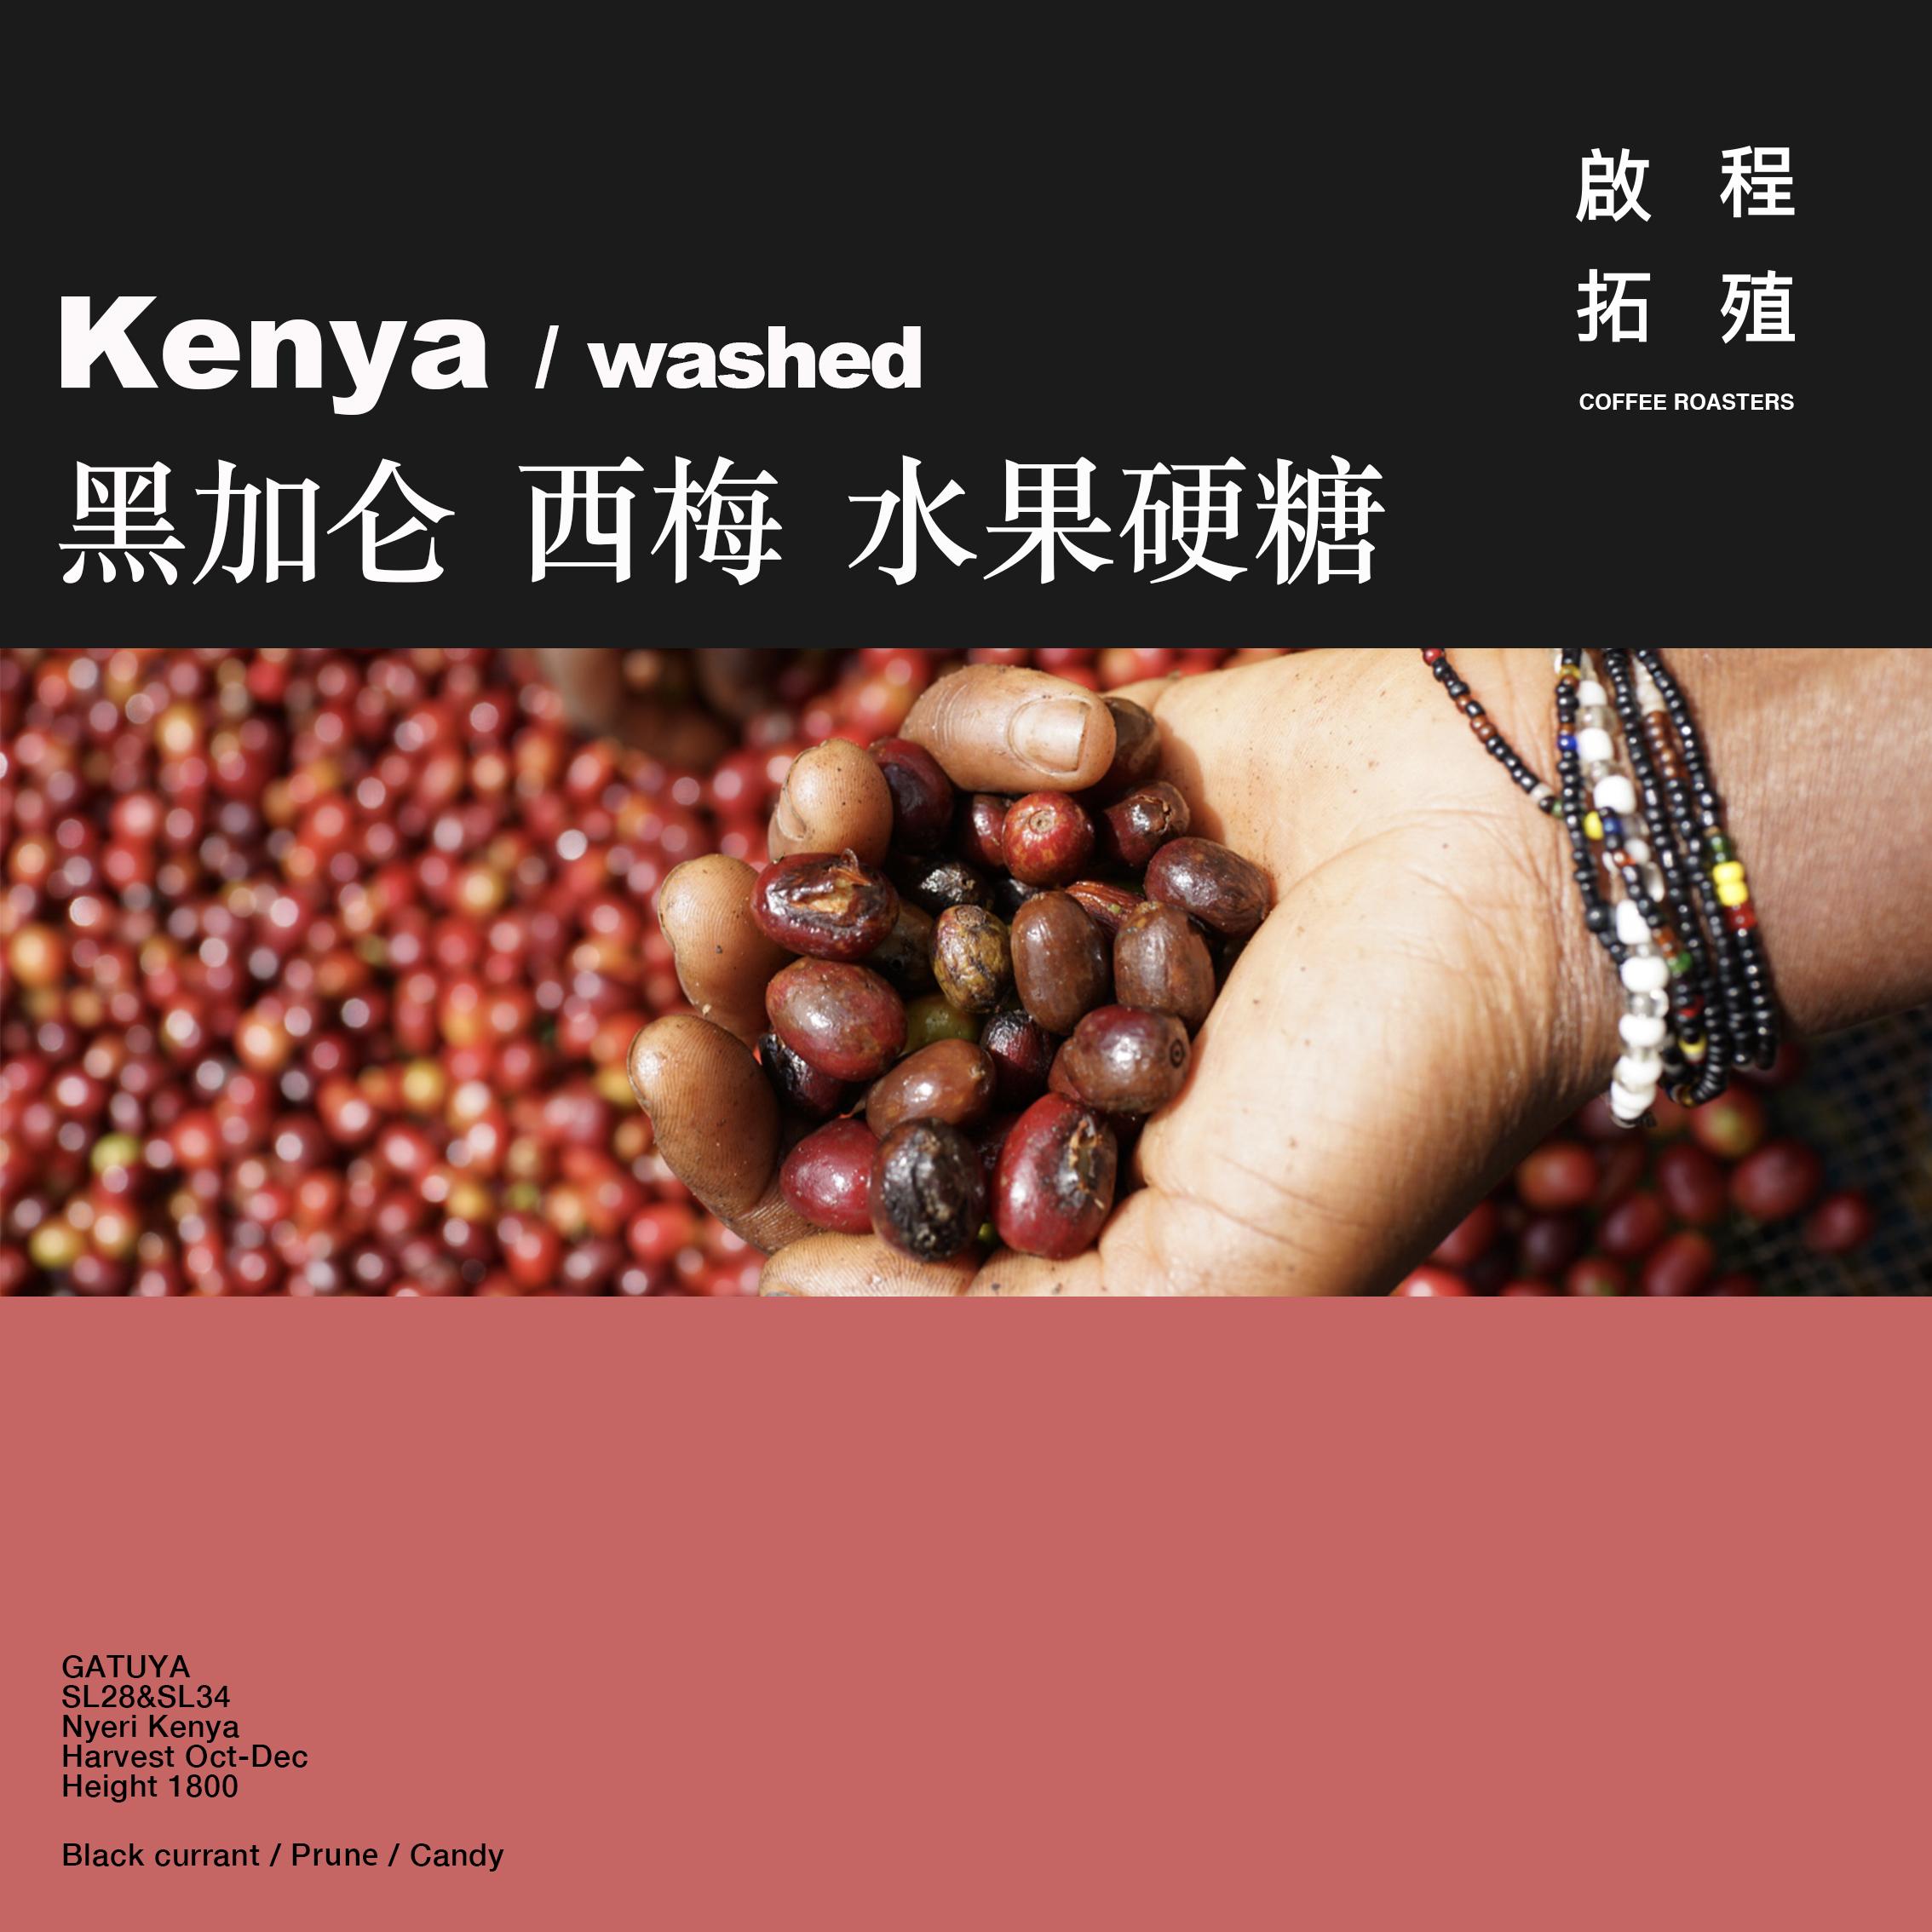 【Terraform】 黑加仑西梅 肯尼亚TOH亚军GATUYA手冲精品咖啡豆